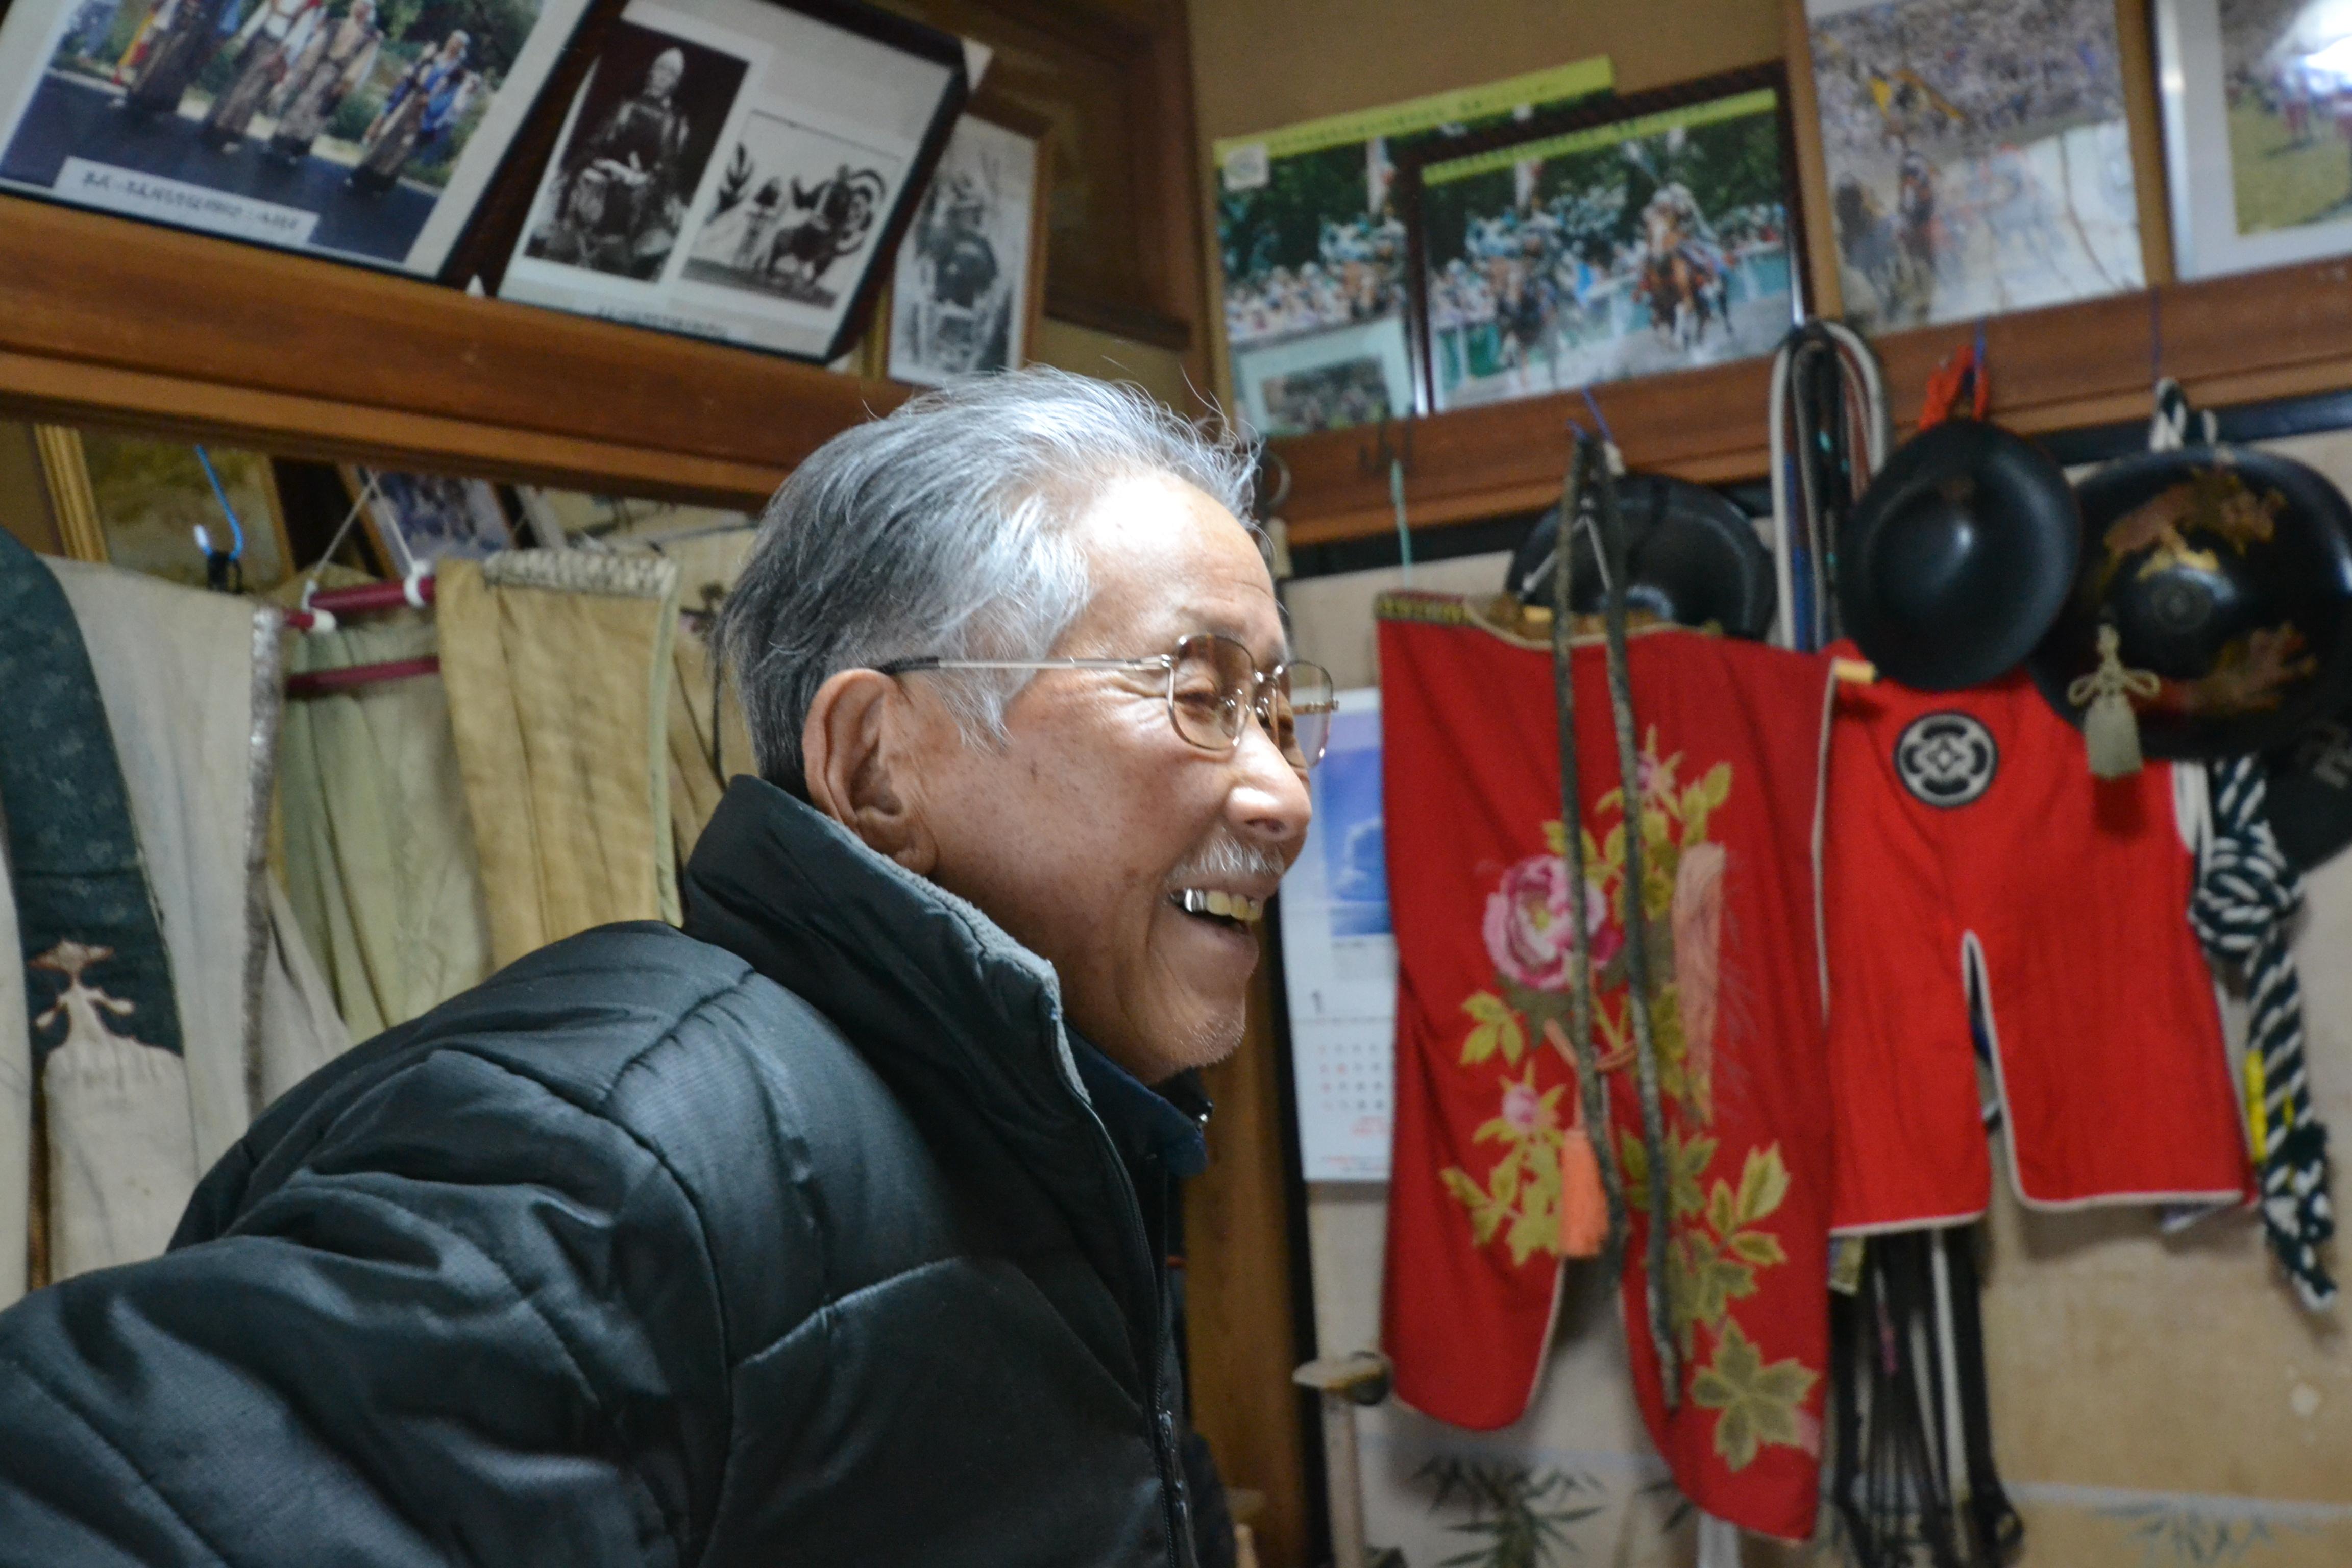 minamisoma samurai with smile photos.JPG